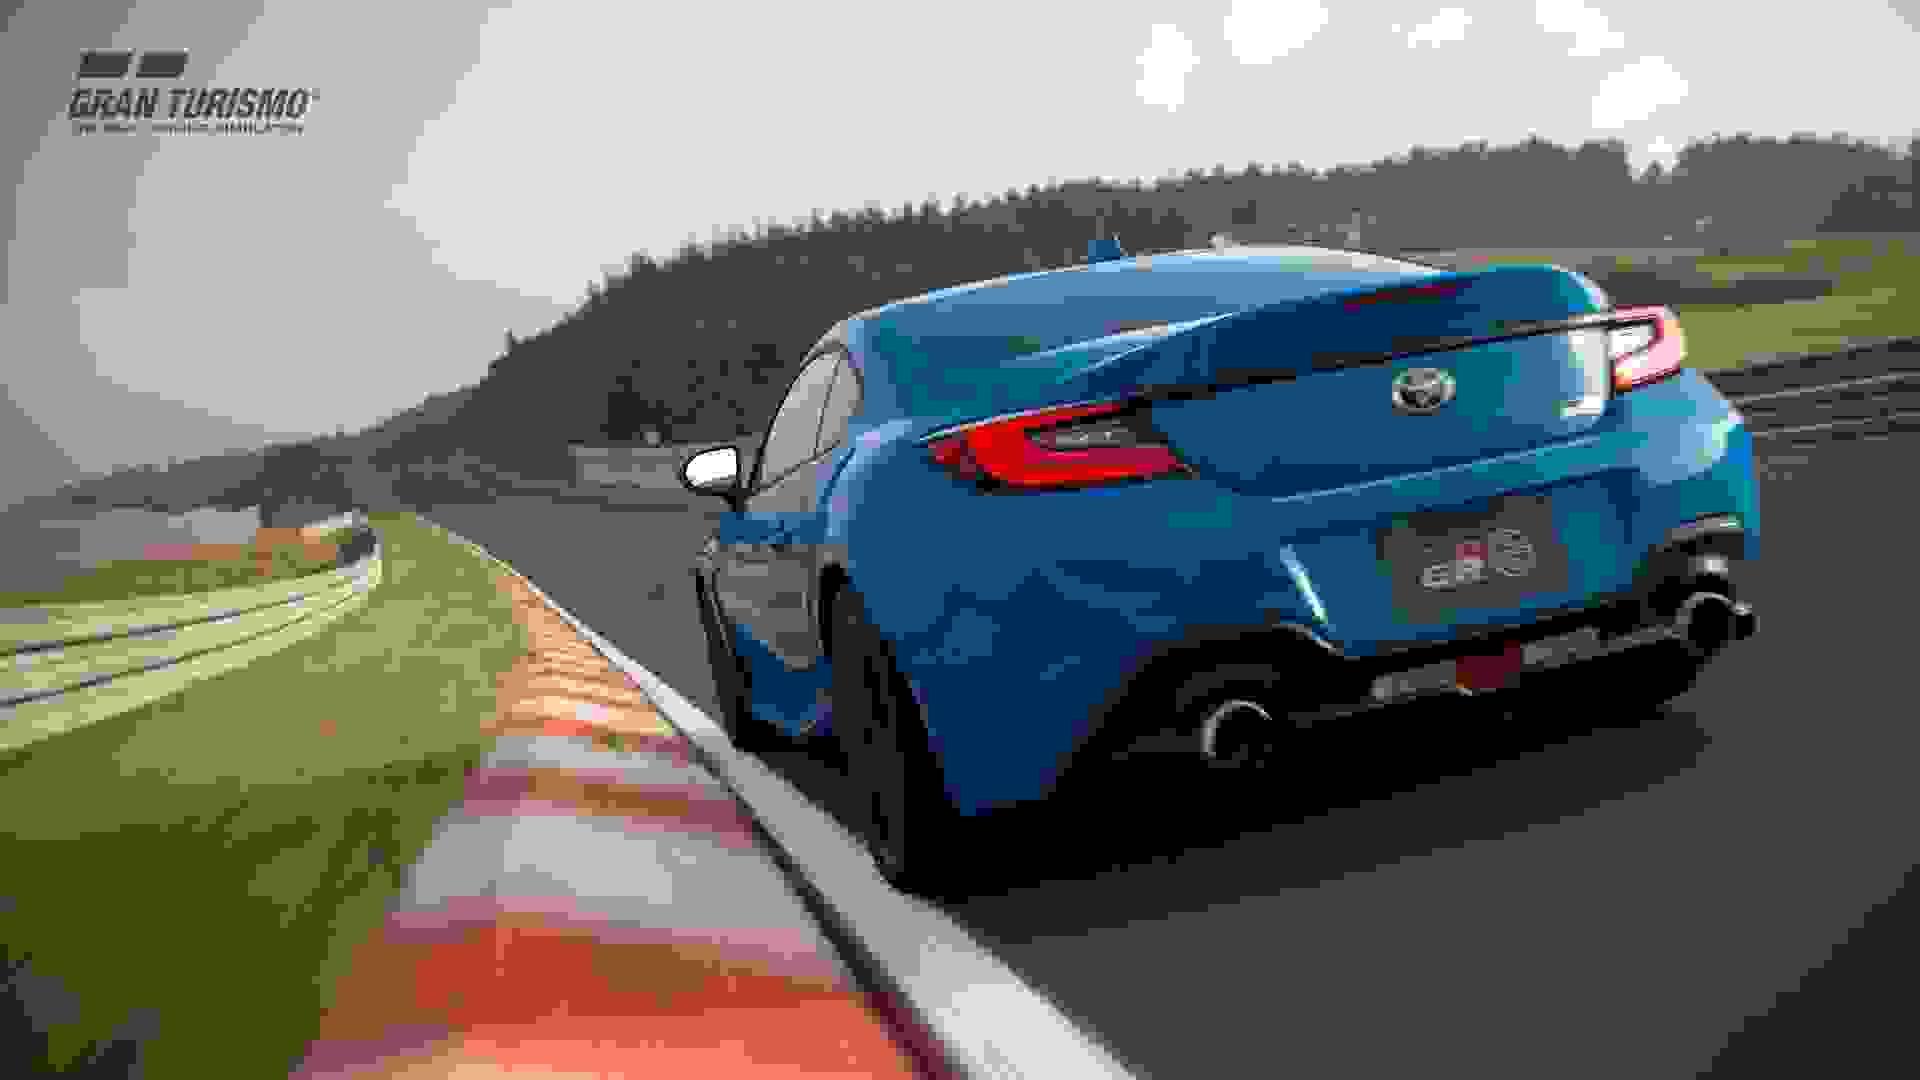 2022_Toyota_GR_86_Gran_Turismo-Sport-0002